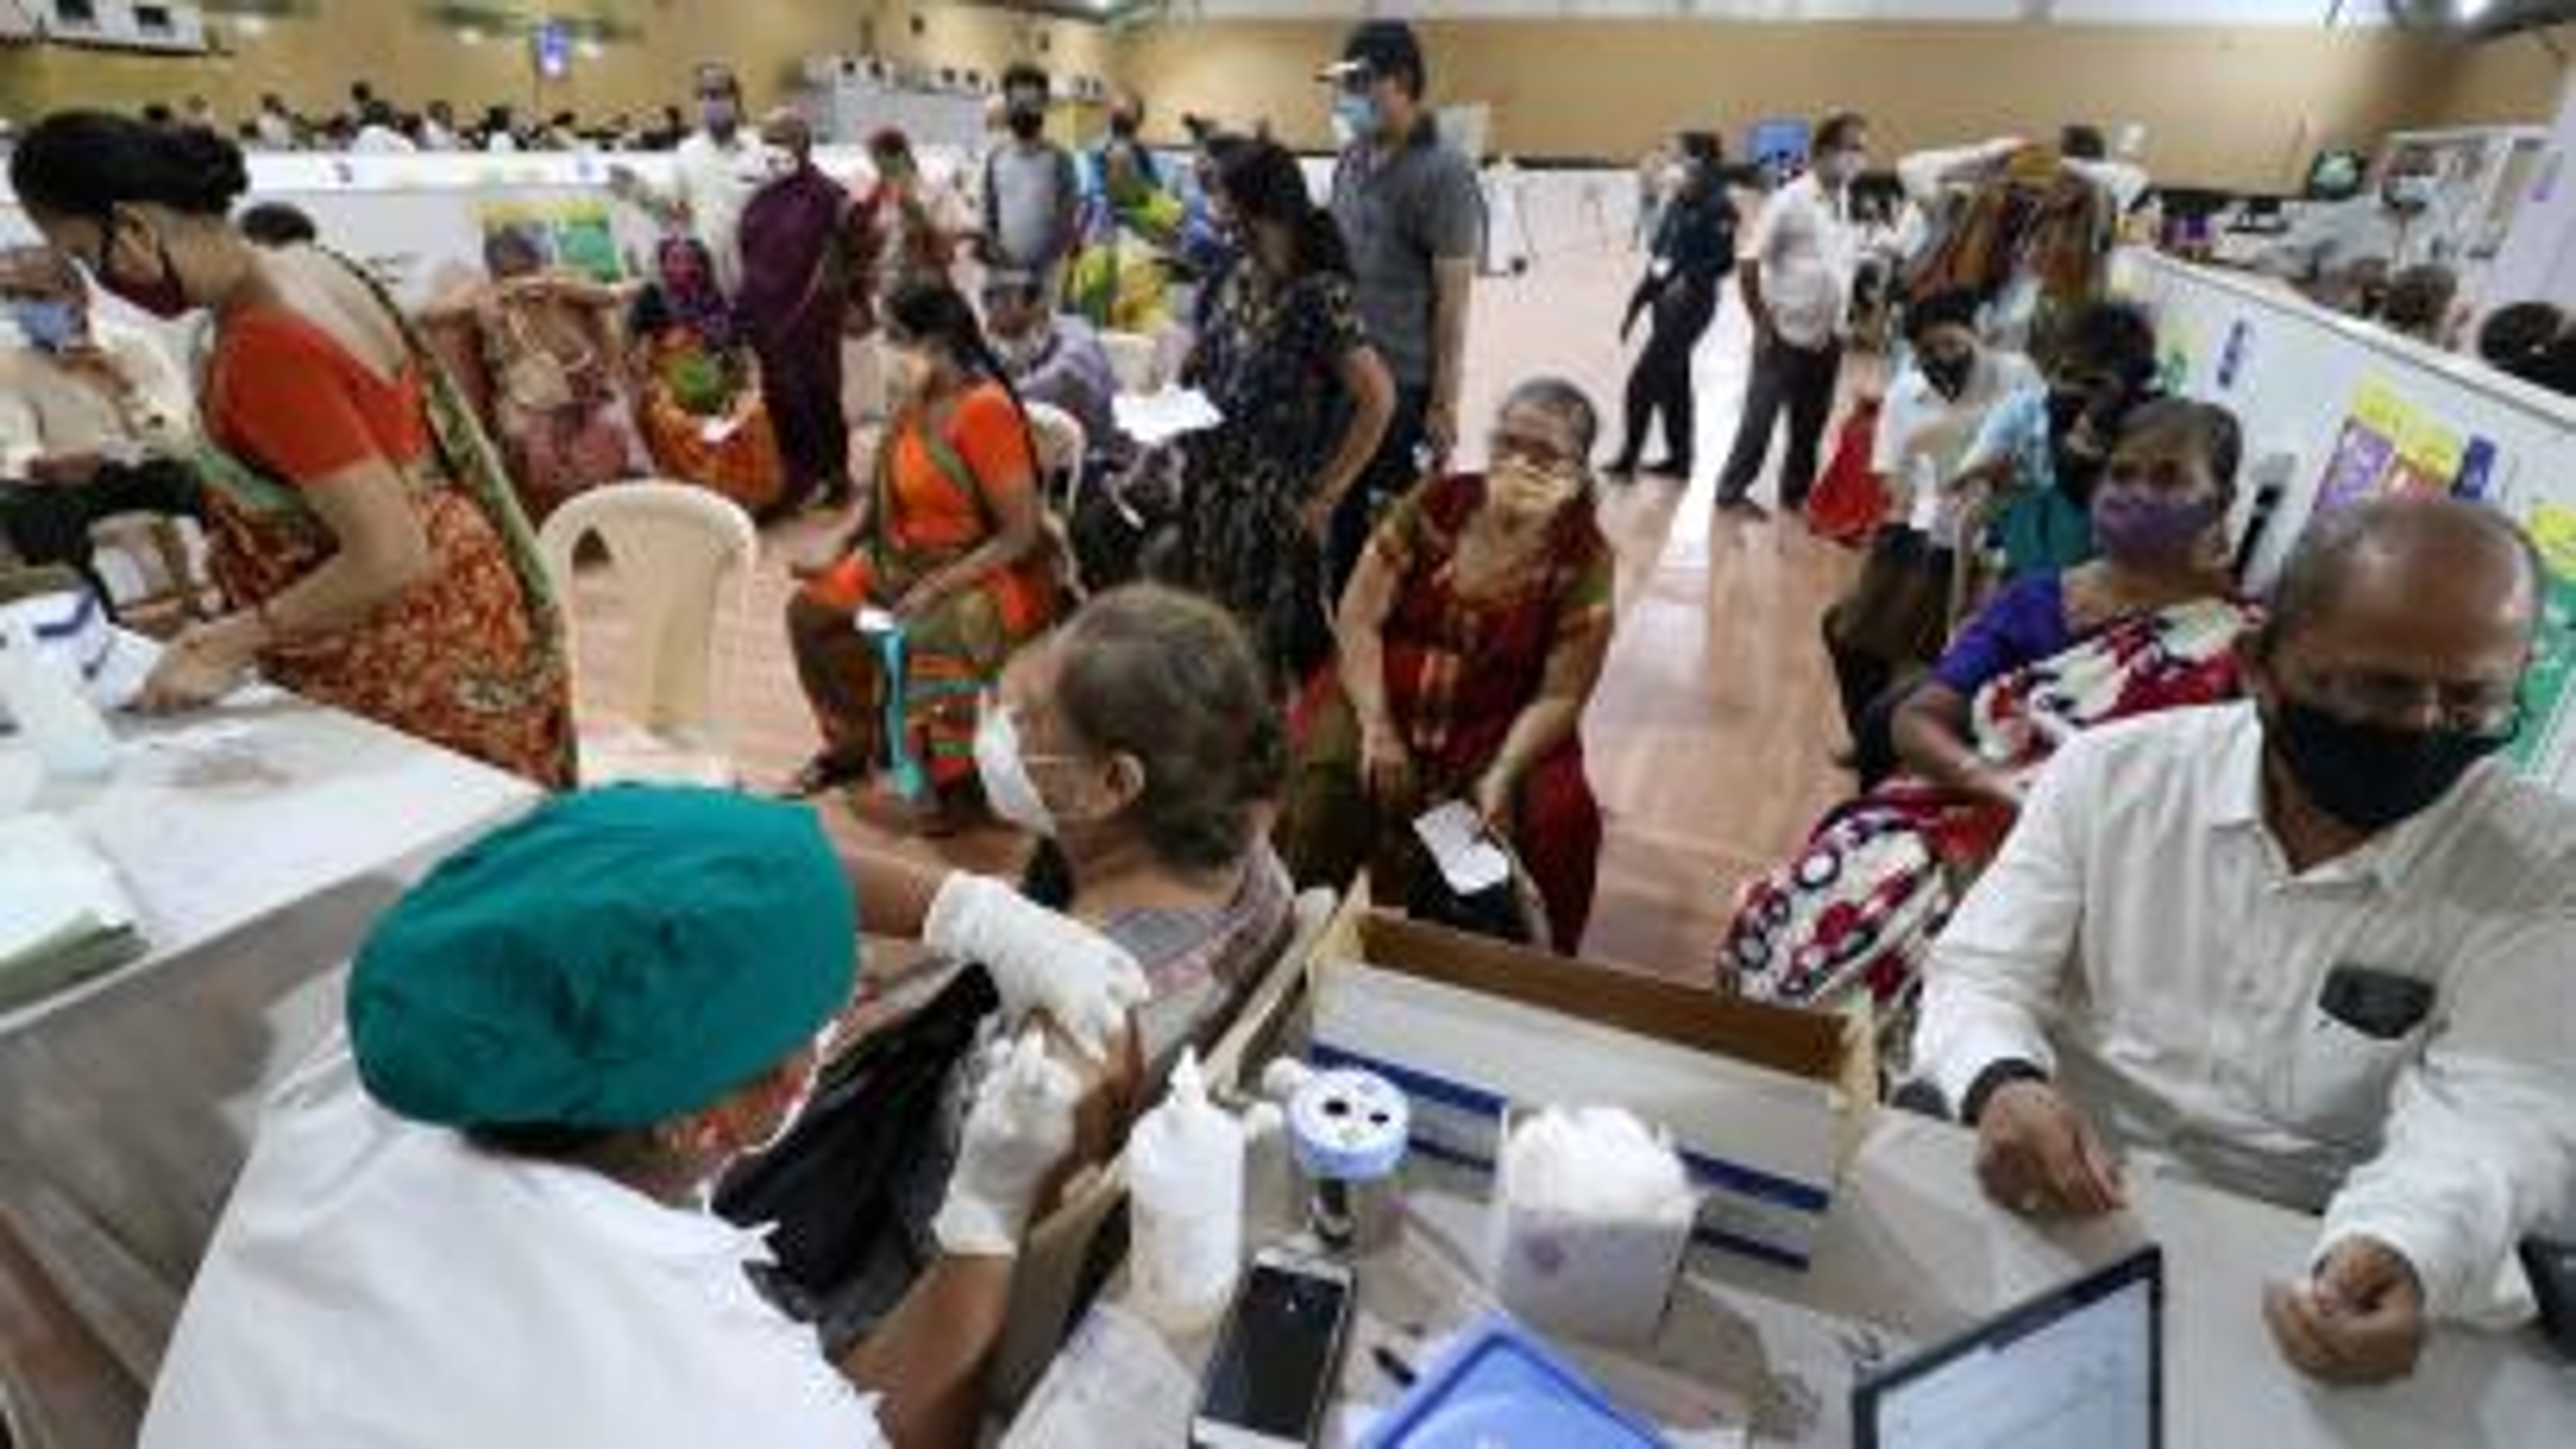 COVID-19 vaccinatin in Mumbai